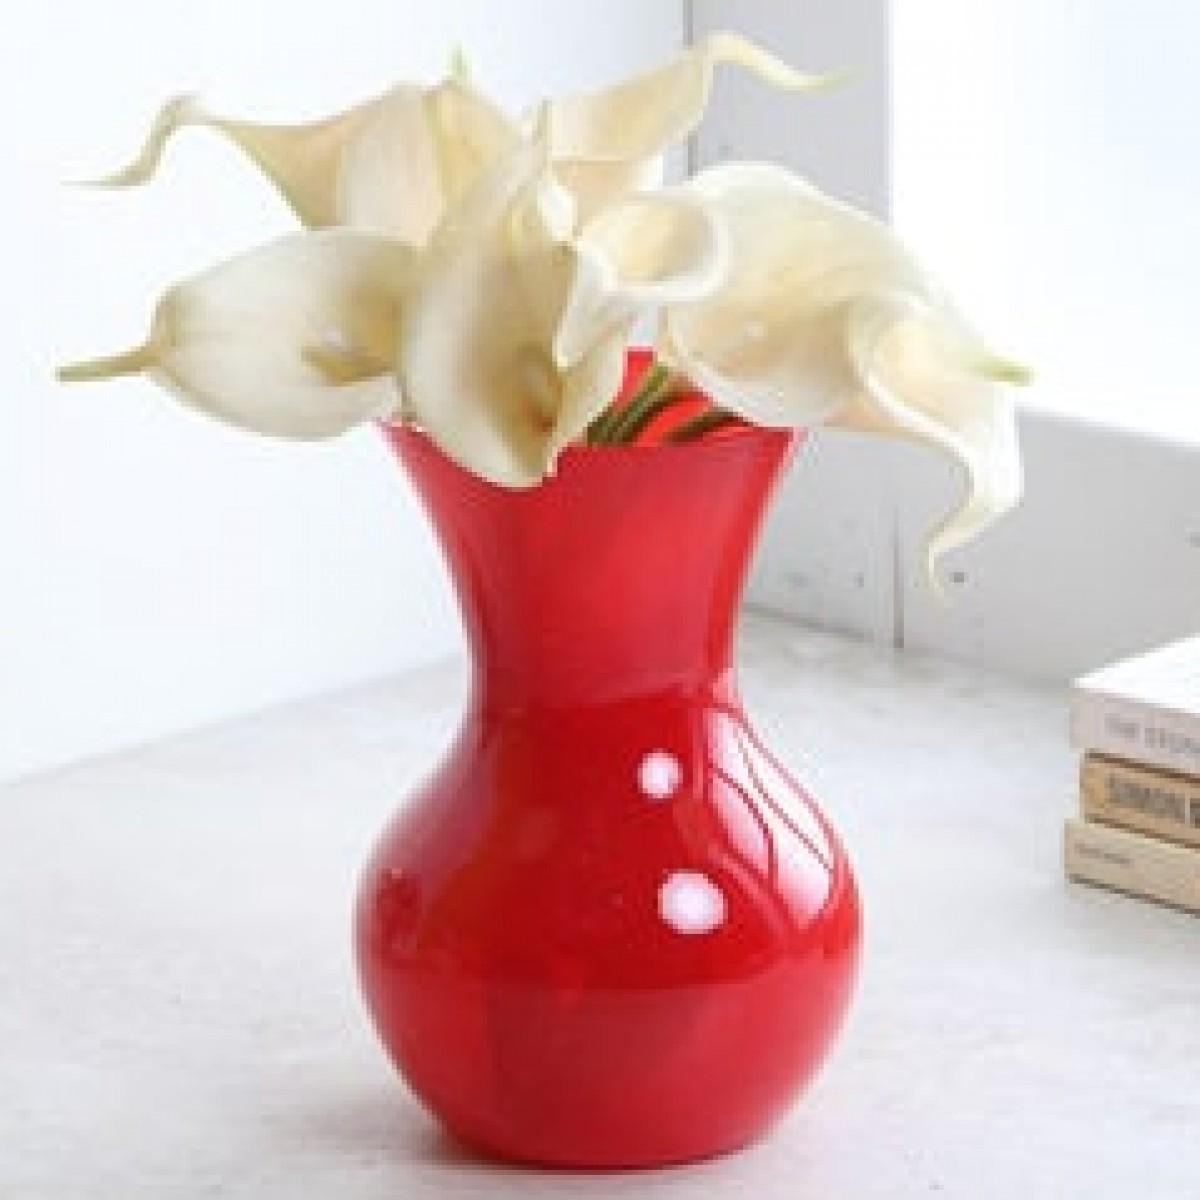 5146 Sweetheart Red 11x18cm Acrylic Vase - 1 No